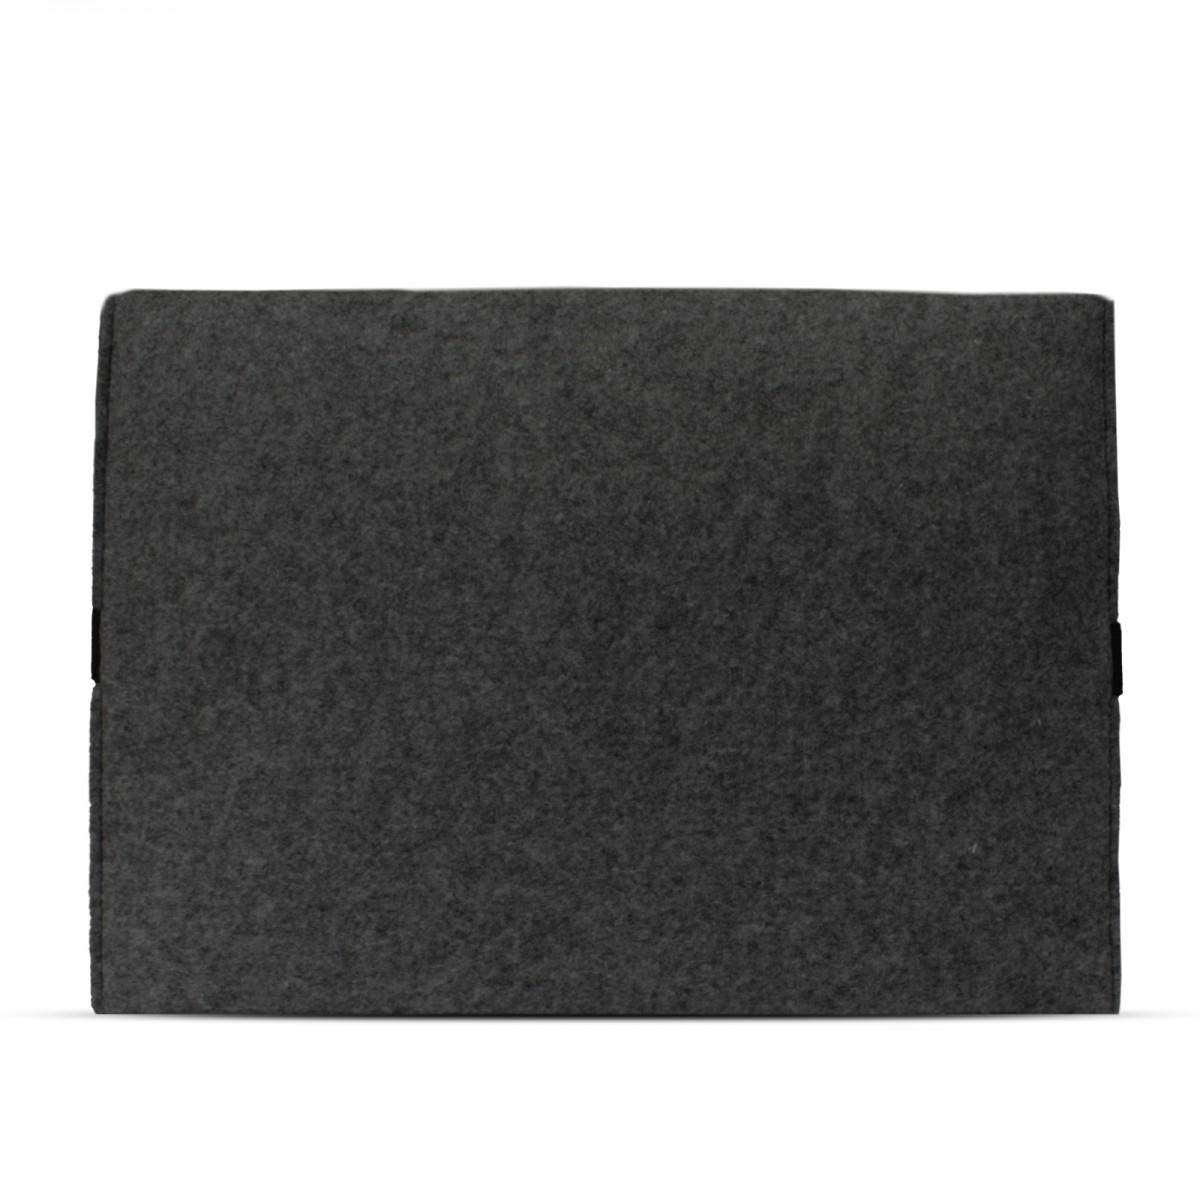 efabrik schutzh lle f r apple macbook pro 13 2016 tasche 13 3 zoll ultrabook laptop case soft. Black Bedroom Furniture Sets. Home Design Ideas